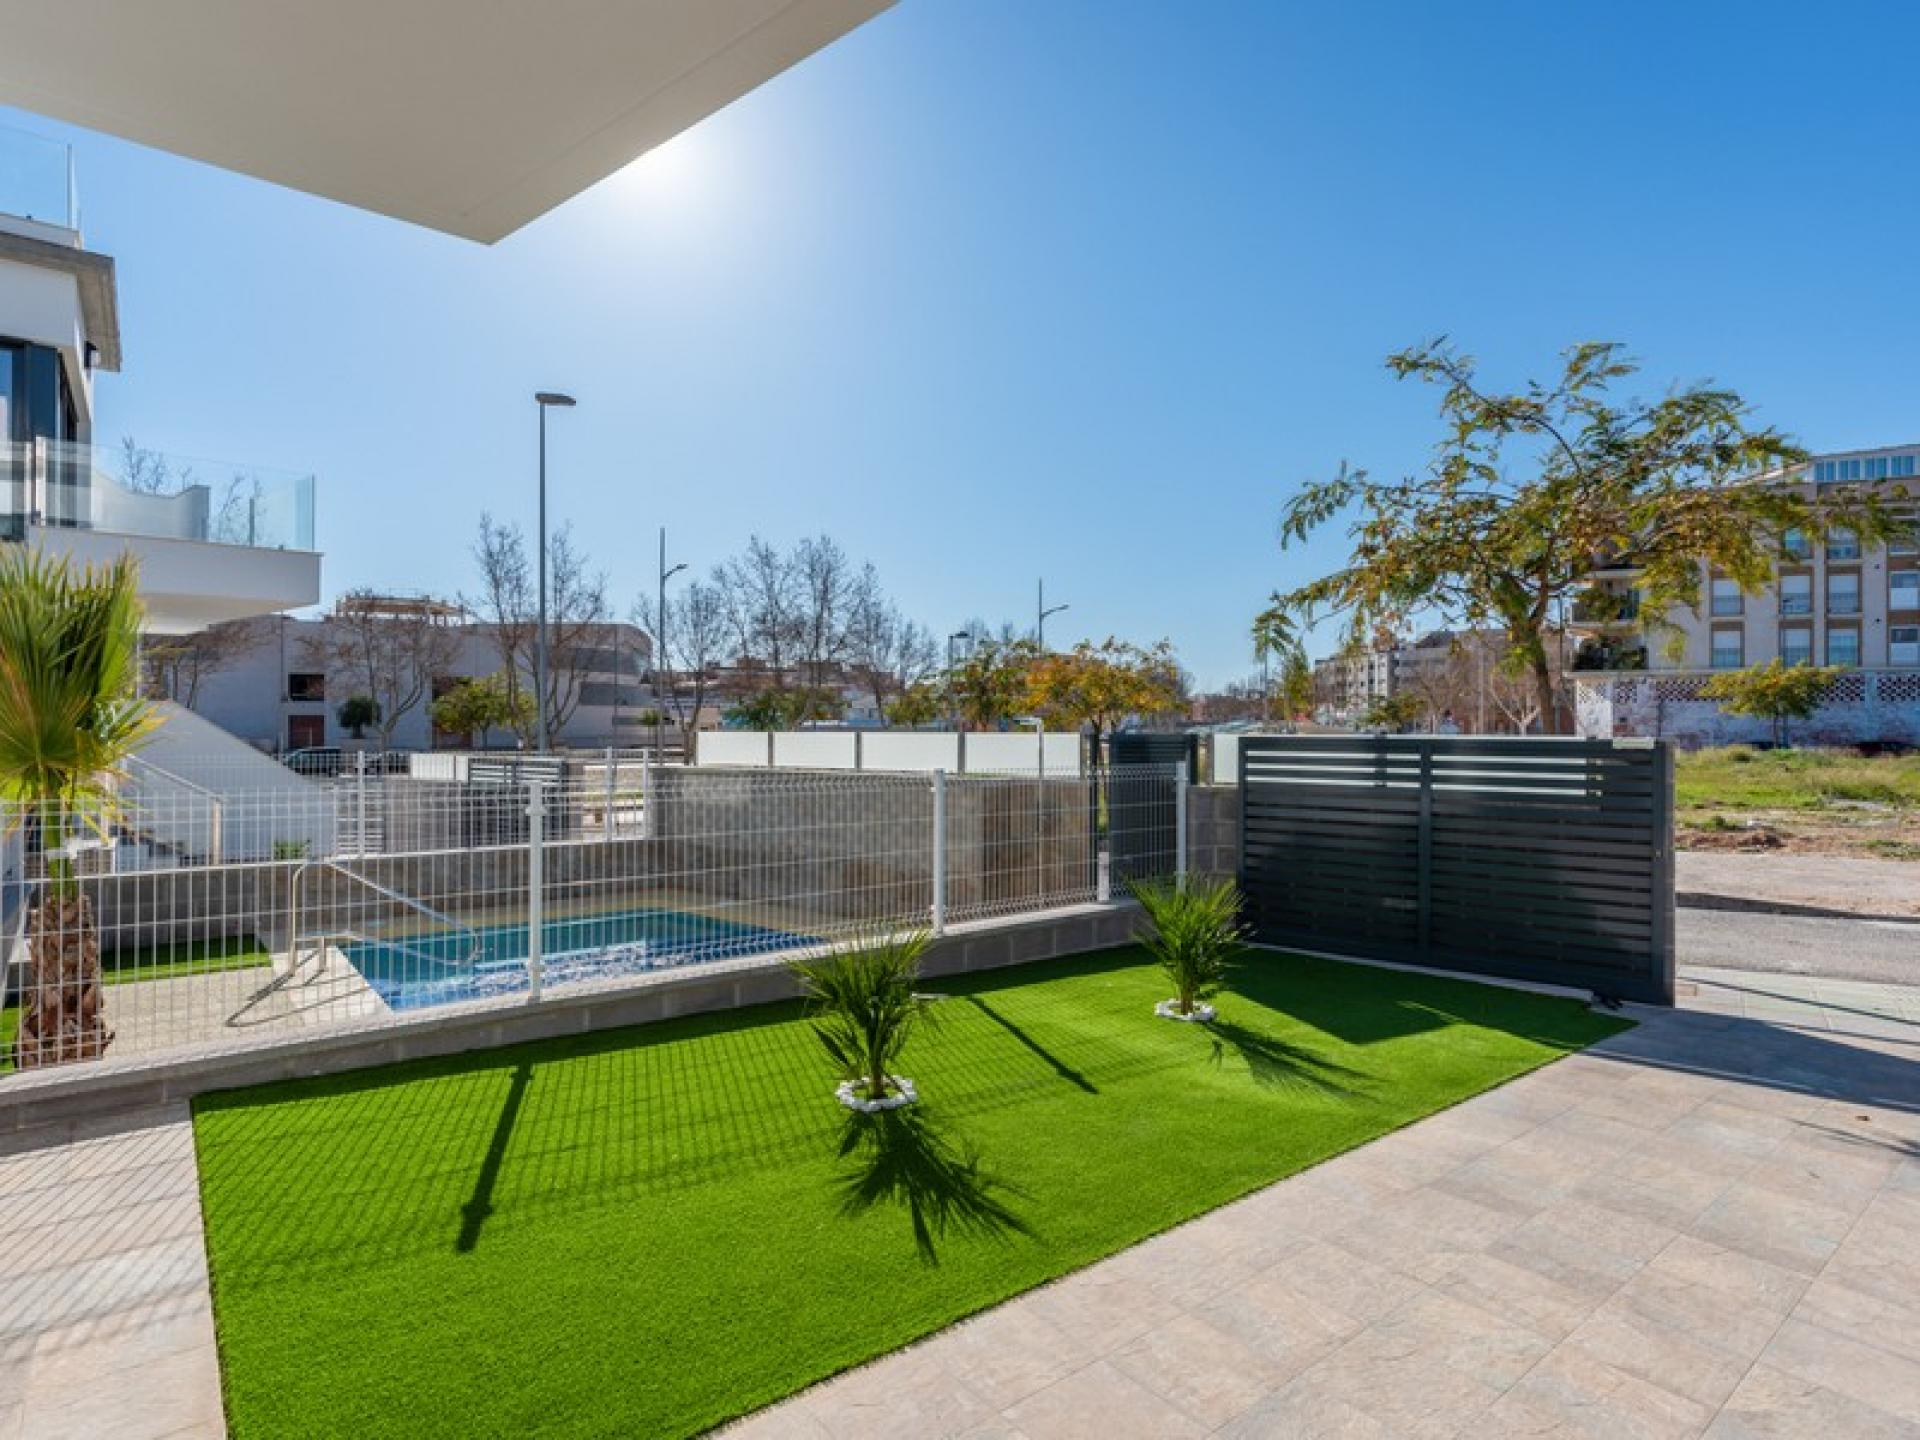 Lamar resort - Pilar de la Horadada